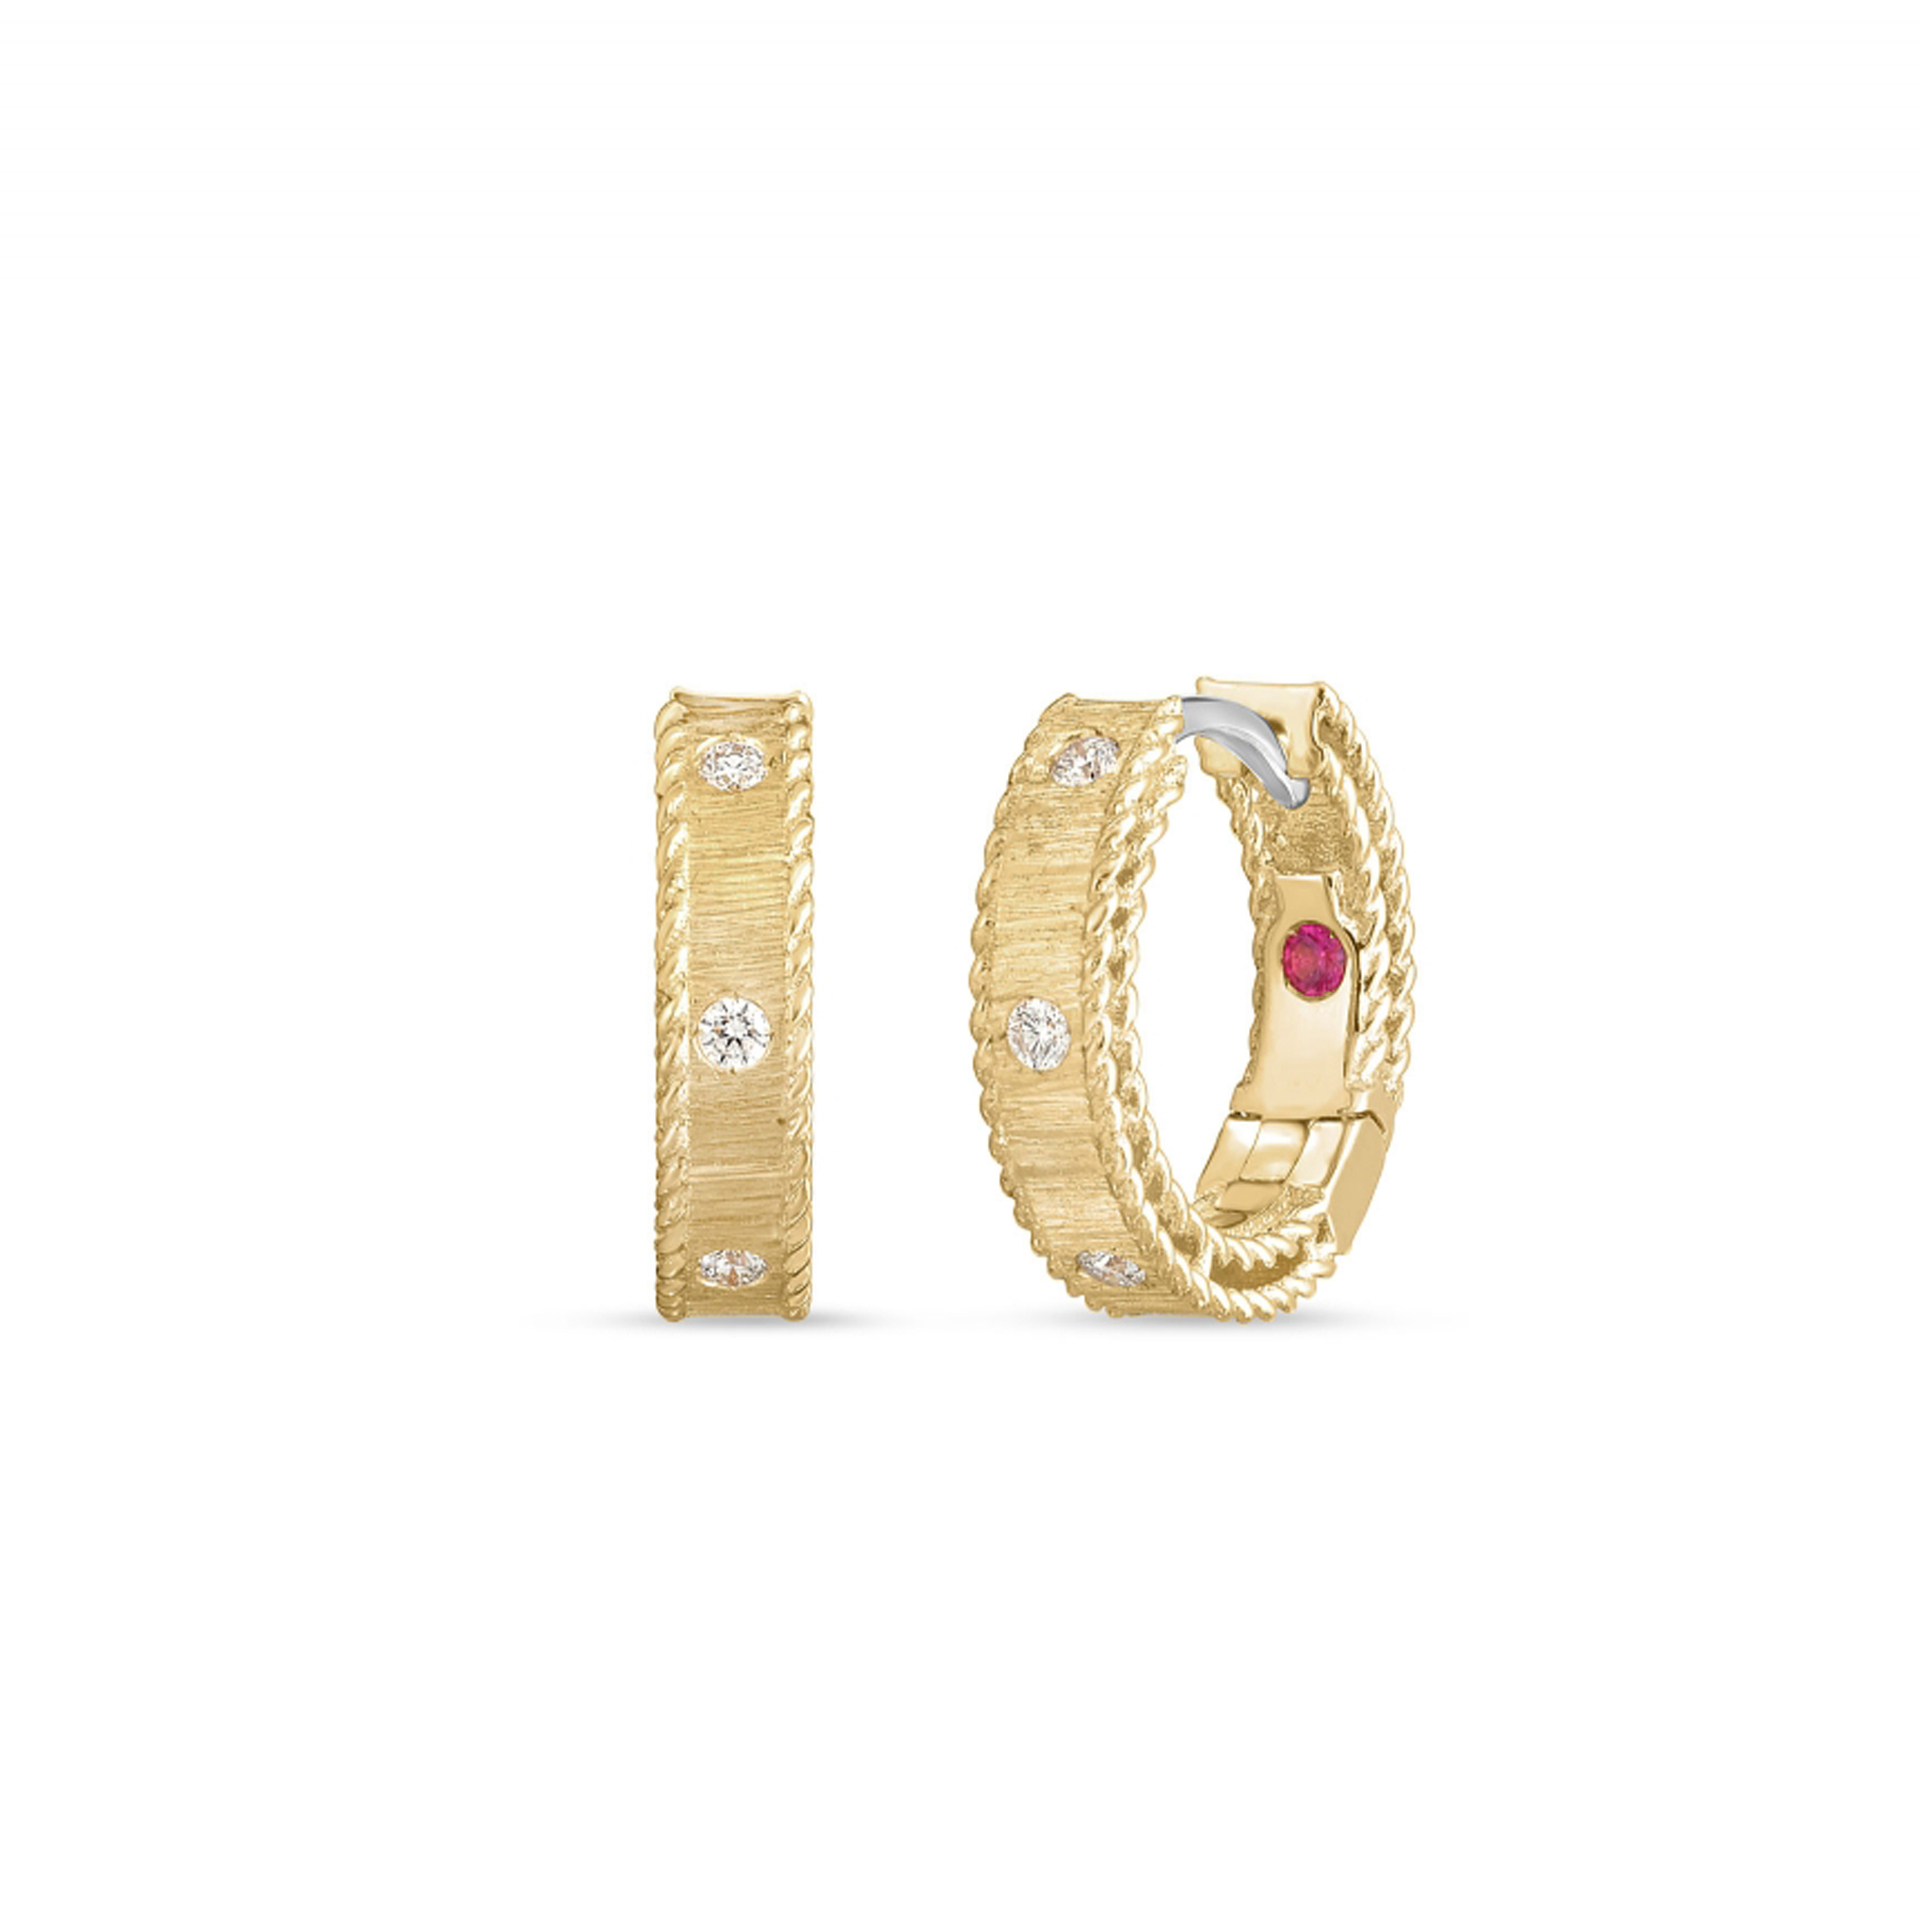 Roberto Coin Princess 18ct Yellow Gold Diamond Set Earrings